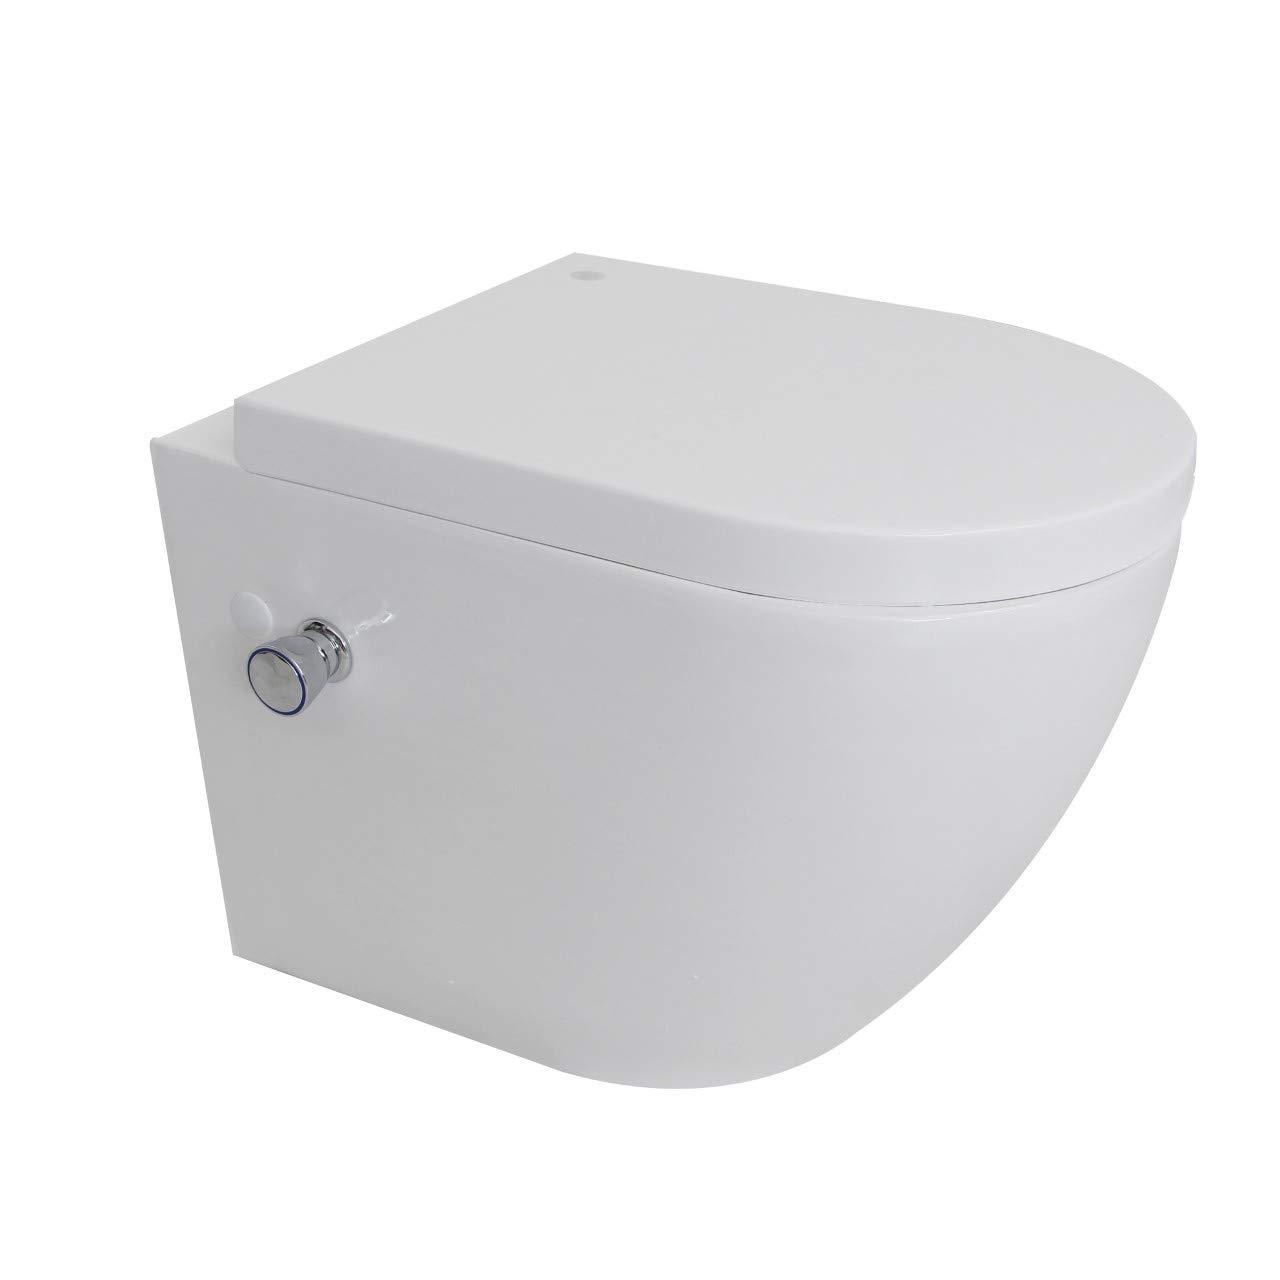 Armatur L//B//H 55 x 36 x 37cm mit Bidet-Funktion Intimdusche homeforyou24 Wand H/änge WC Sp/ülrandlos Taharet Dusch-WC Toilette Softclose inkl